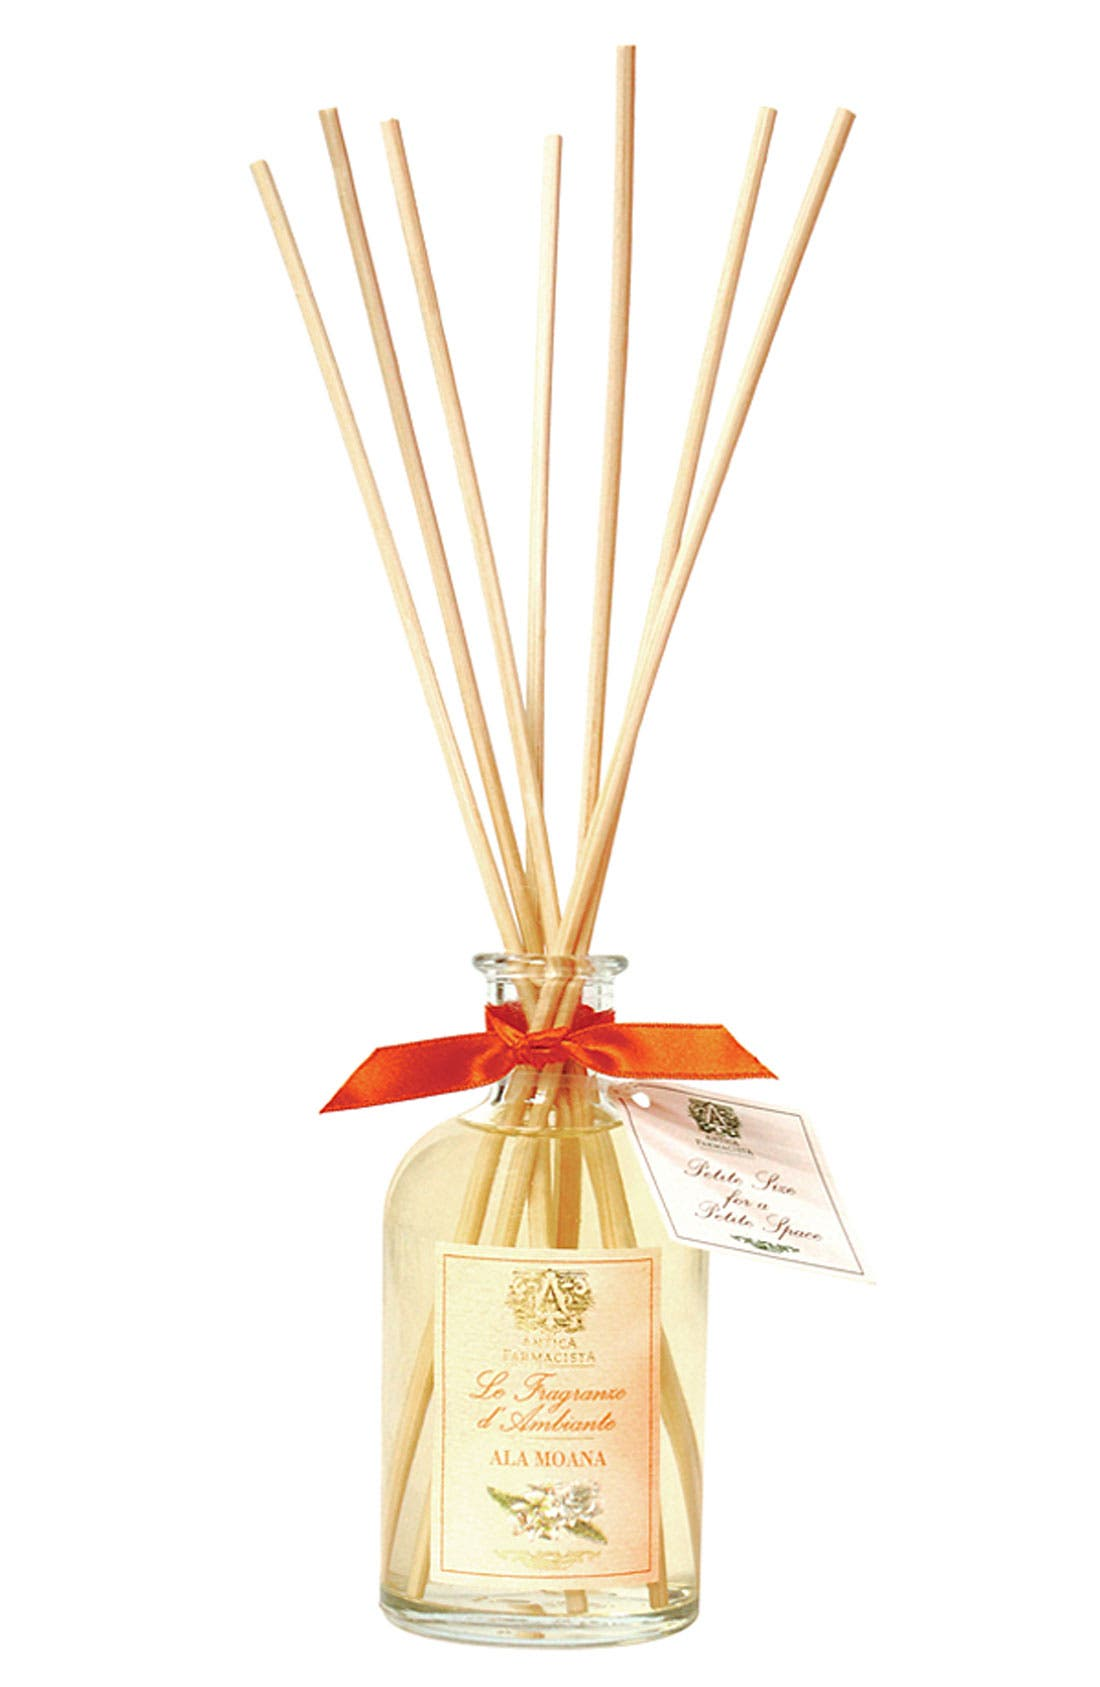 Antica Farmacista 'Ala Moana' Home Ambiance Perfume (3.3 oz.)